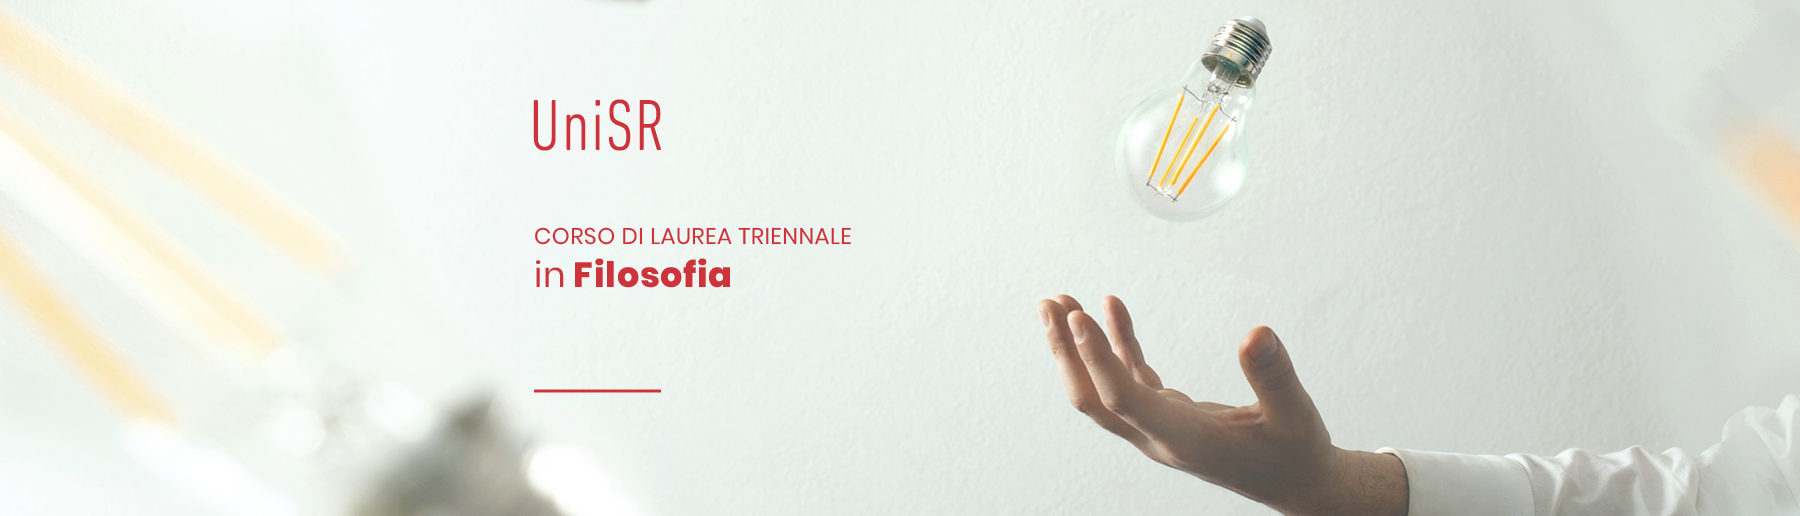 Calendario Filosofico 2020 Dove Si Compra.Home Page Universita Vita Salute San Raffaele